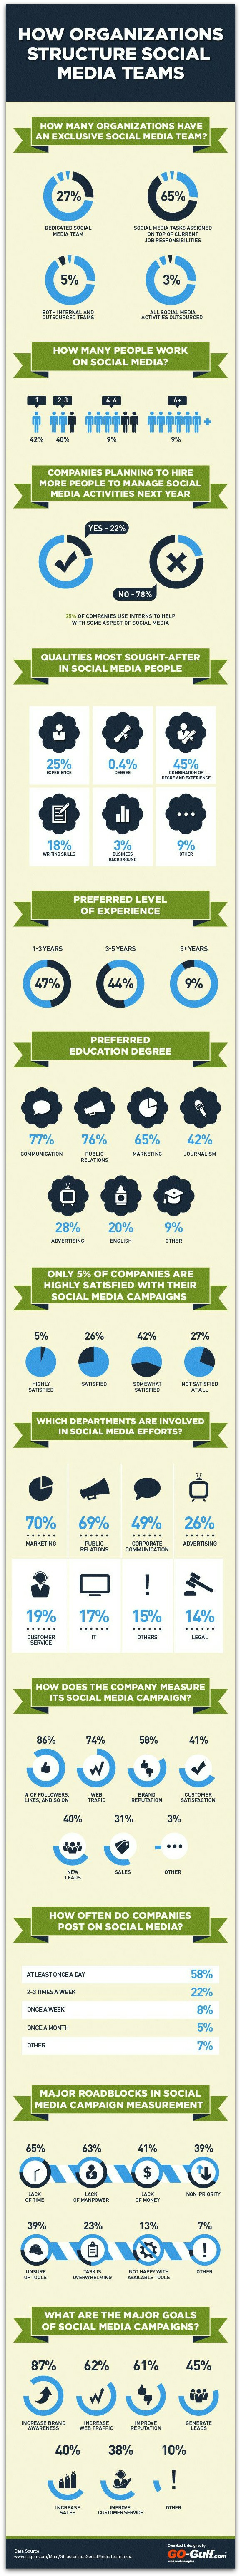 Social_Media_Team_Survey_Infographic